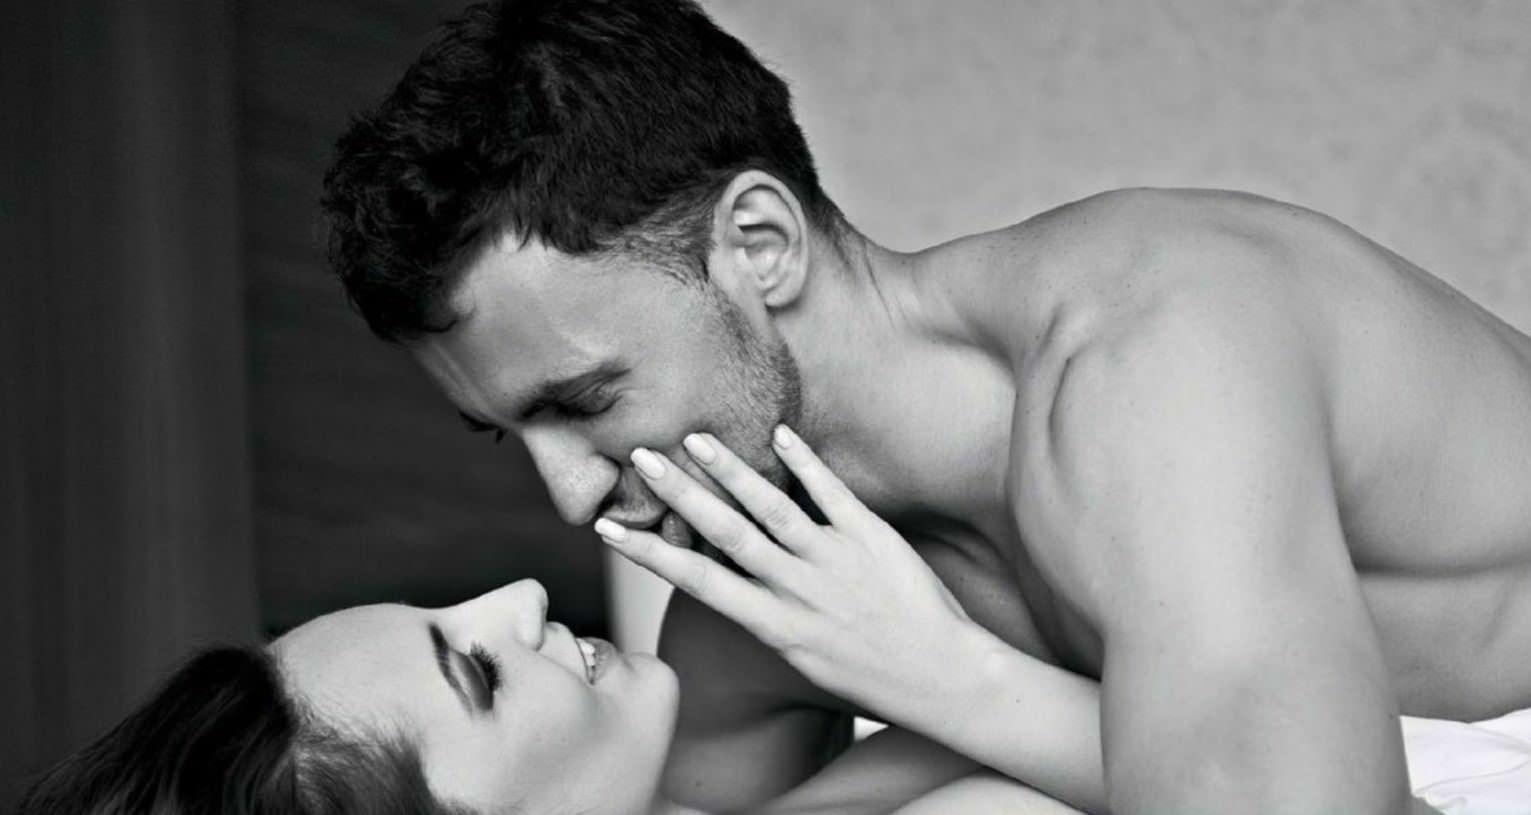 Women have oragasms during sex